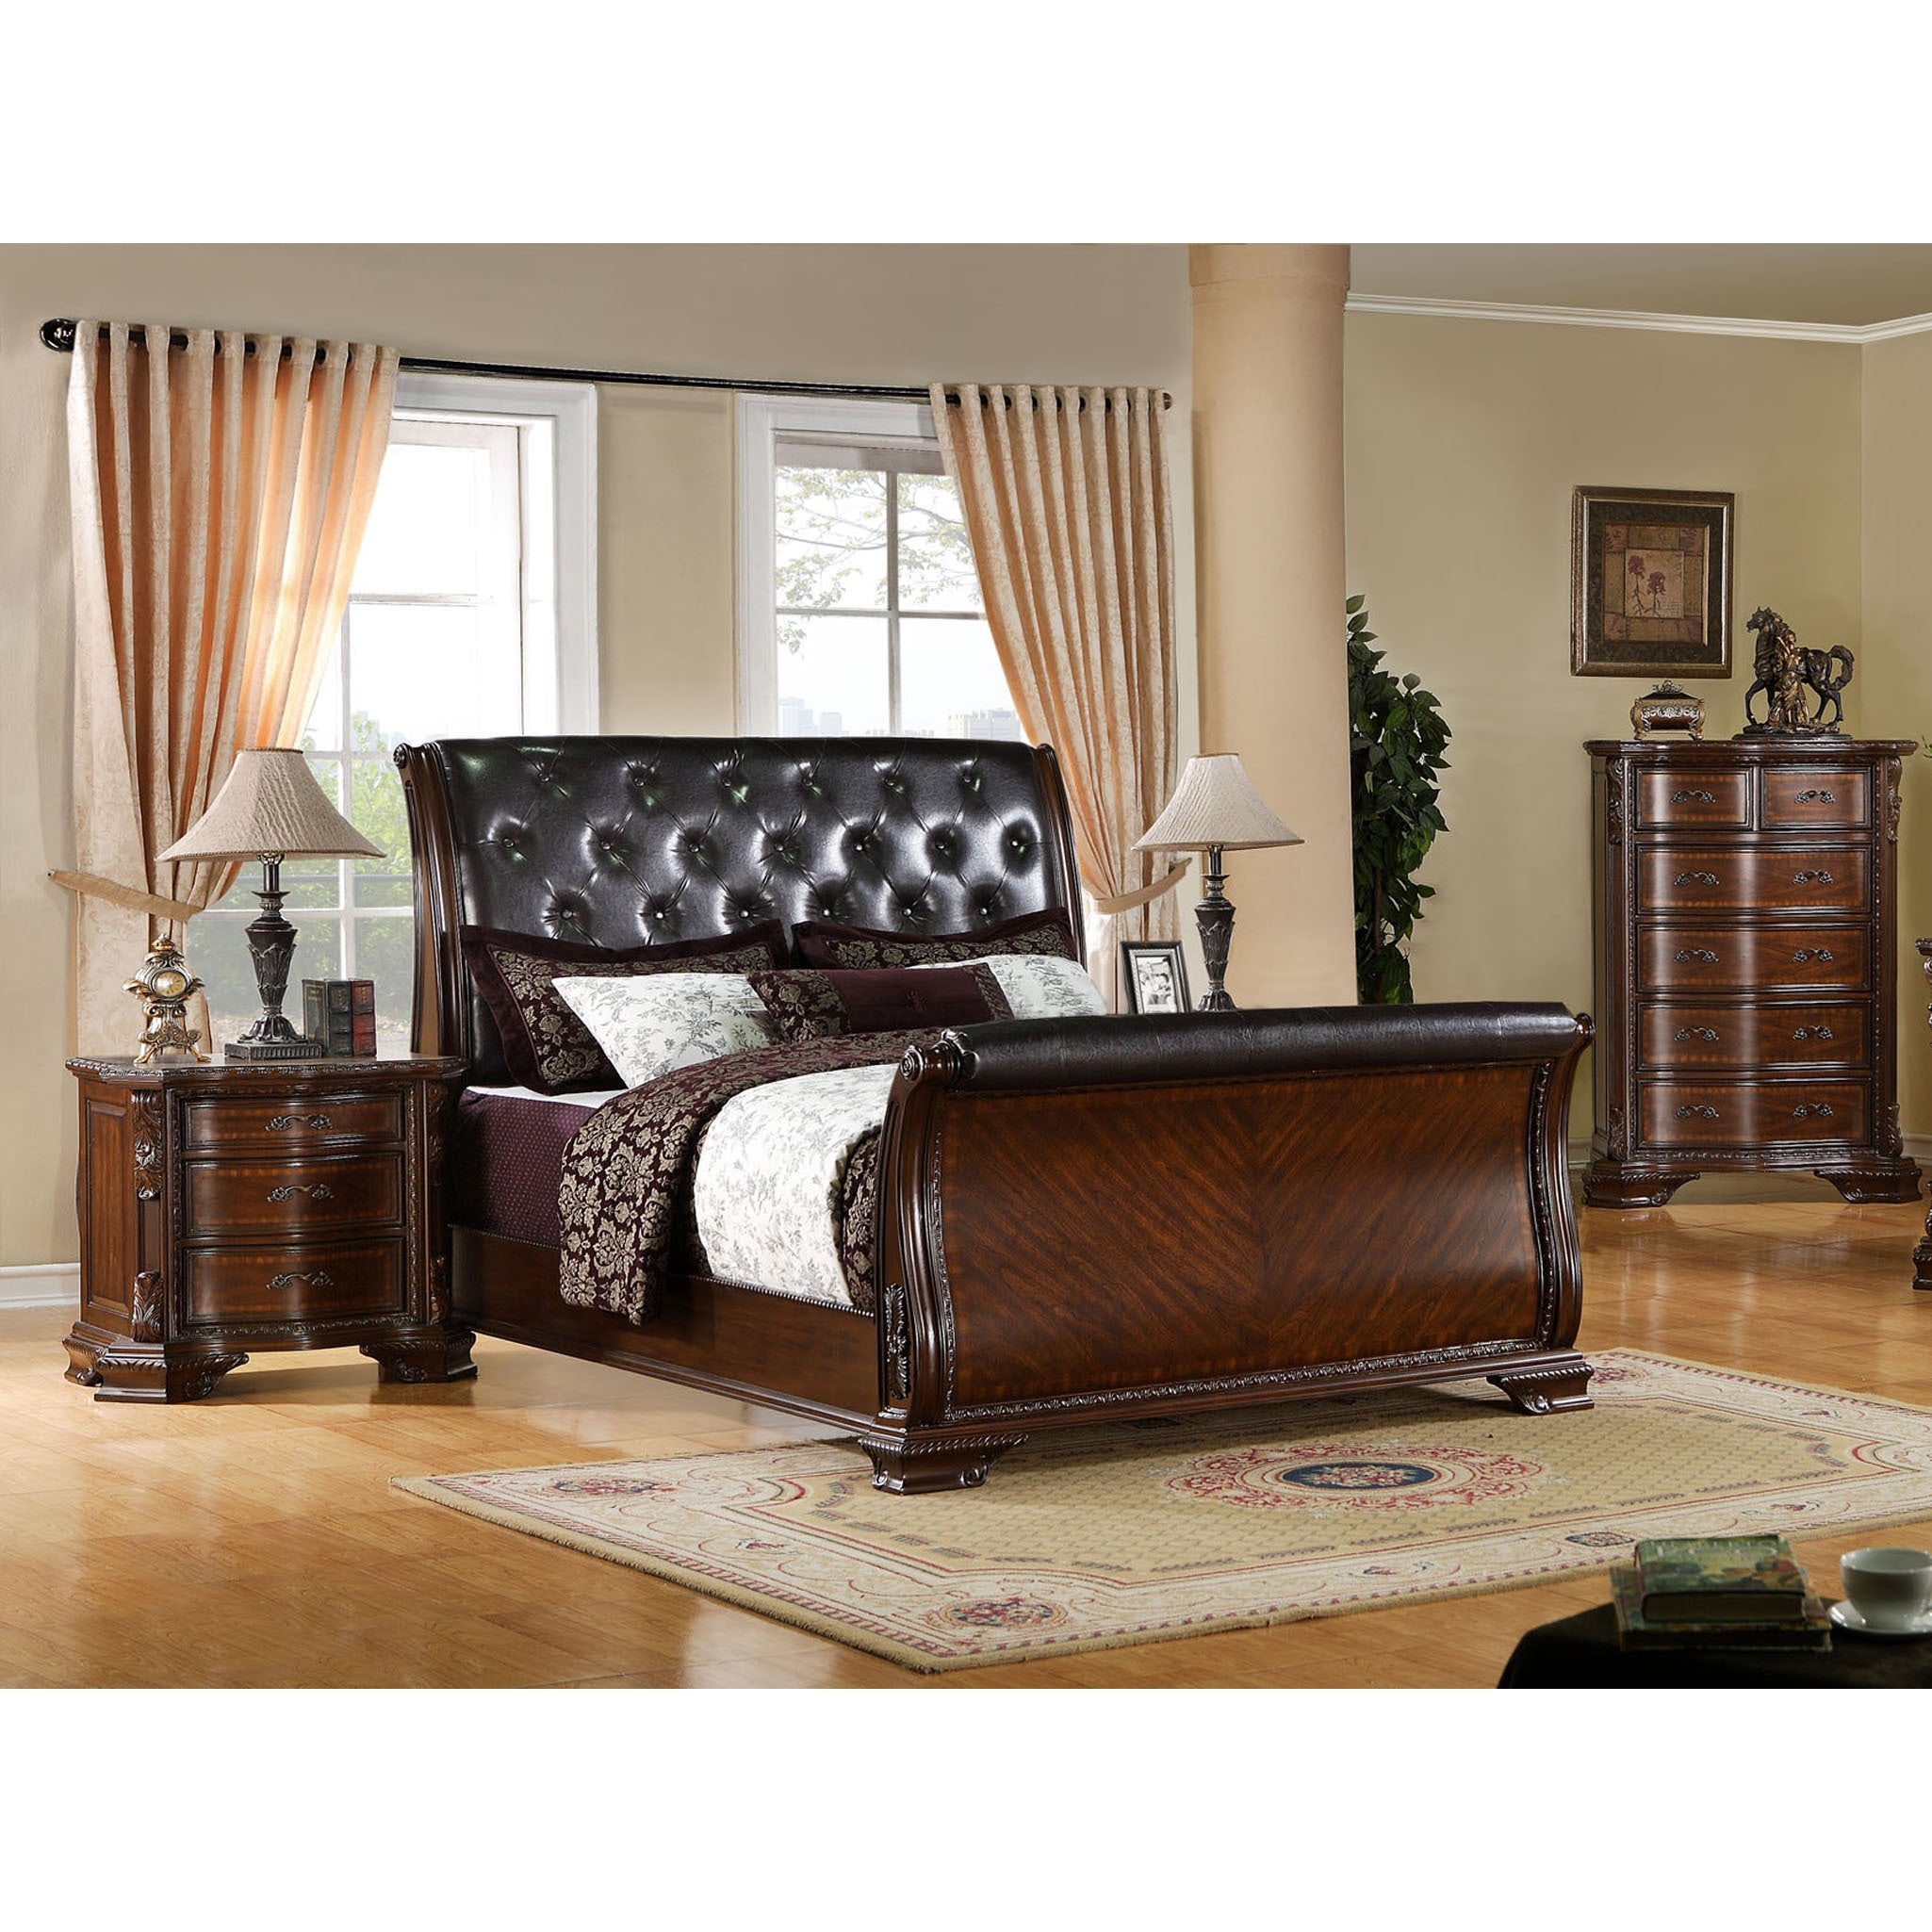 Furniture of America Luxury Brown Cherry Leatherette Baro...